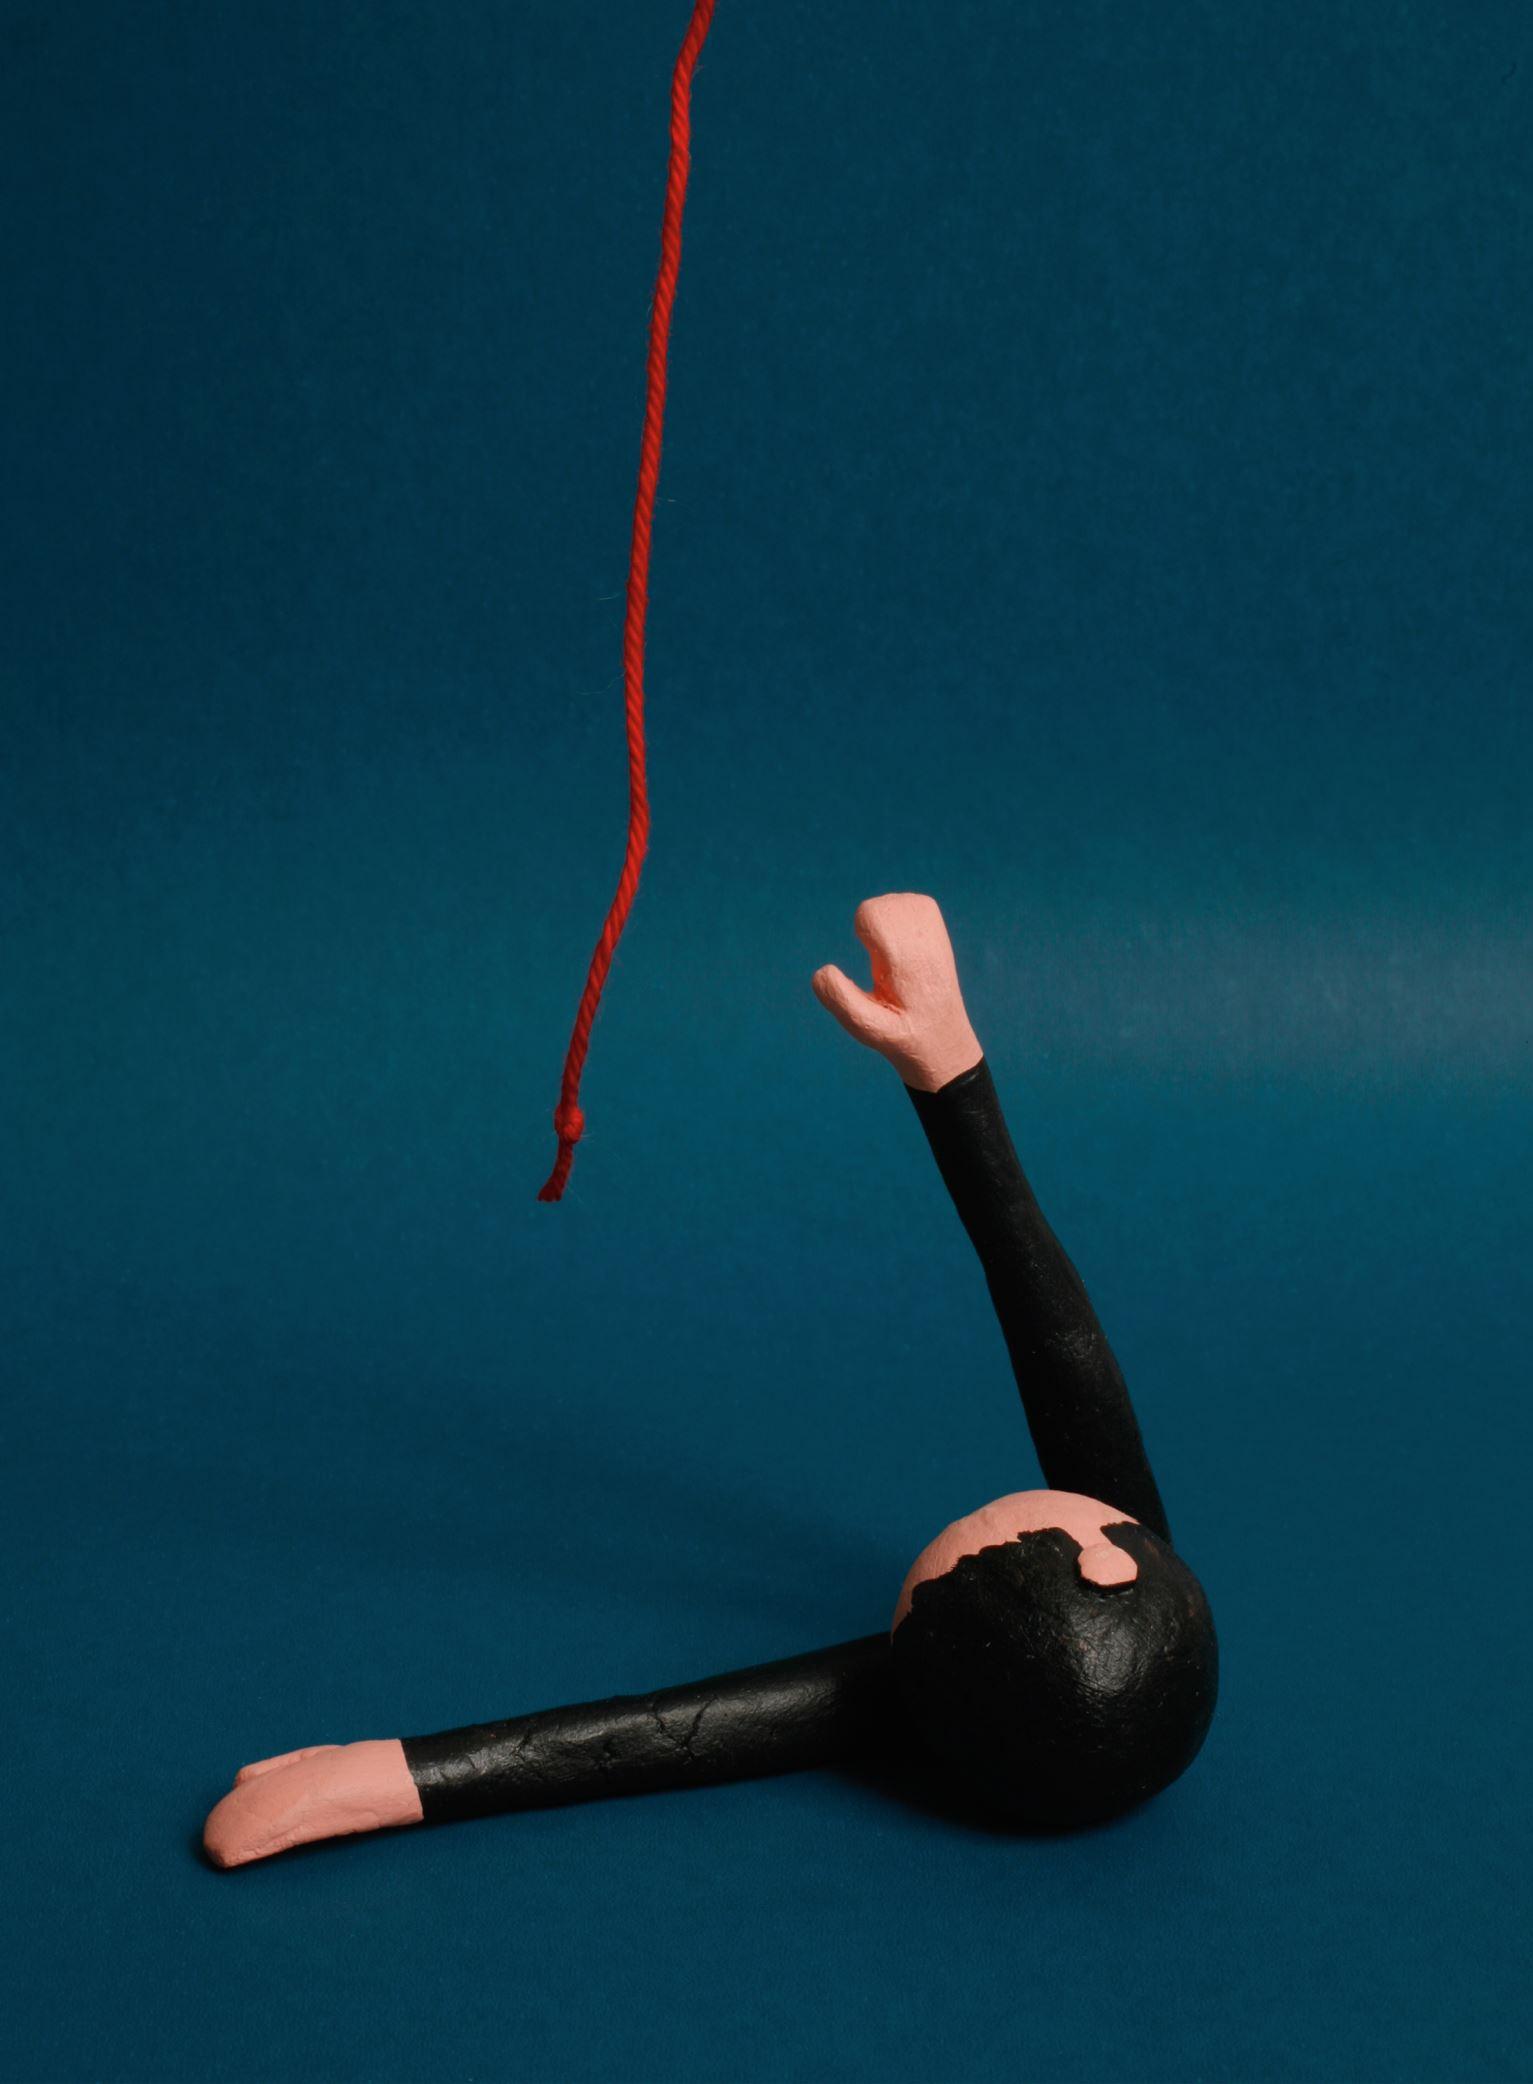 poppetje dat rode draad probeert te pakken